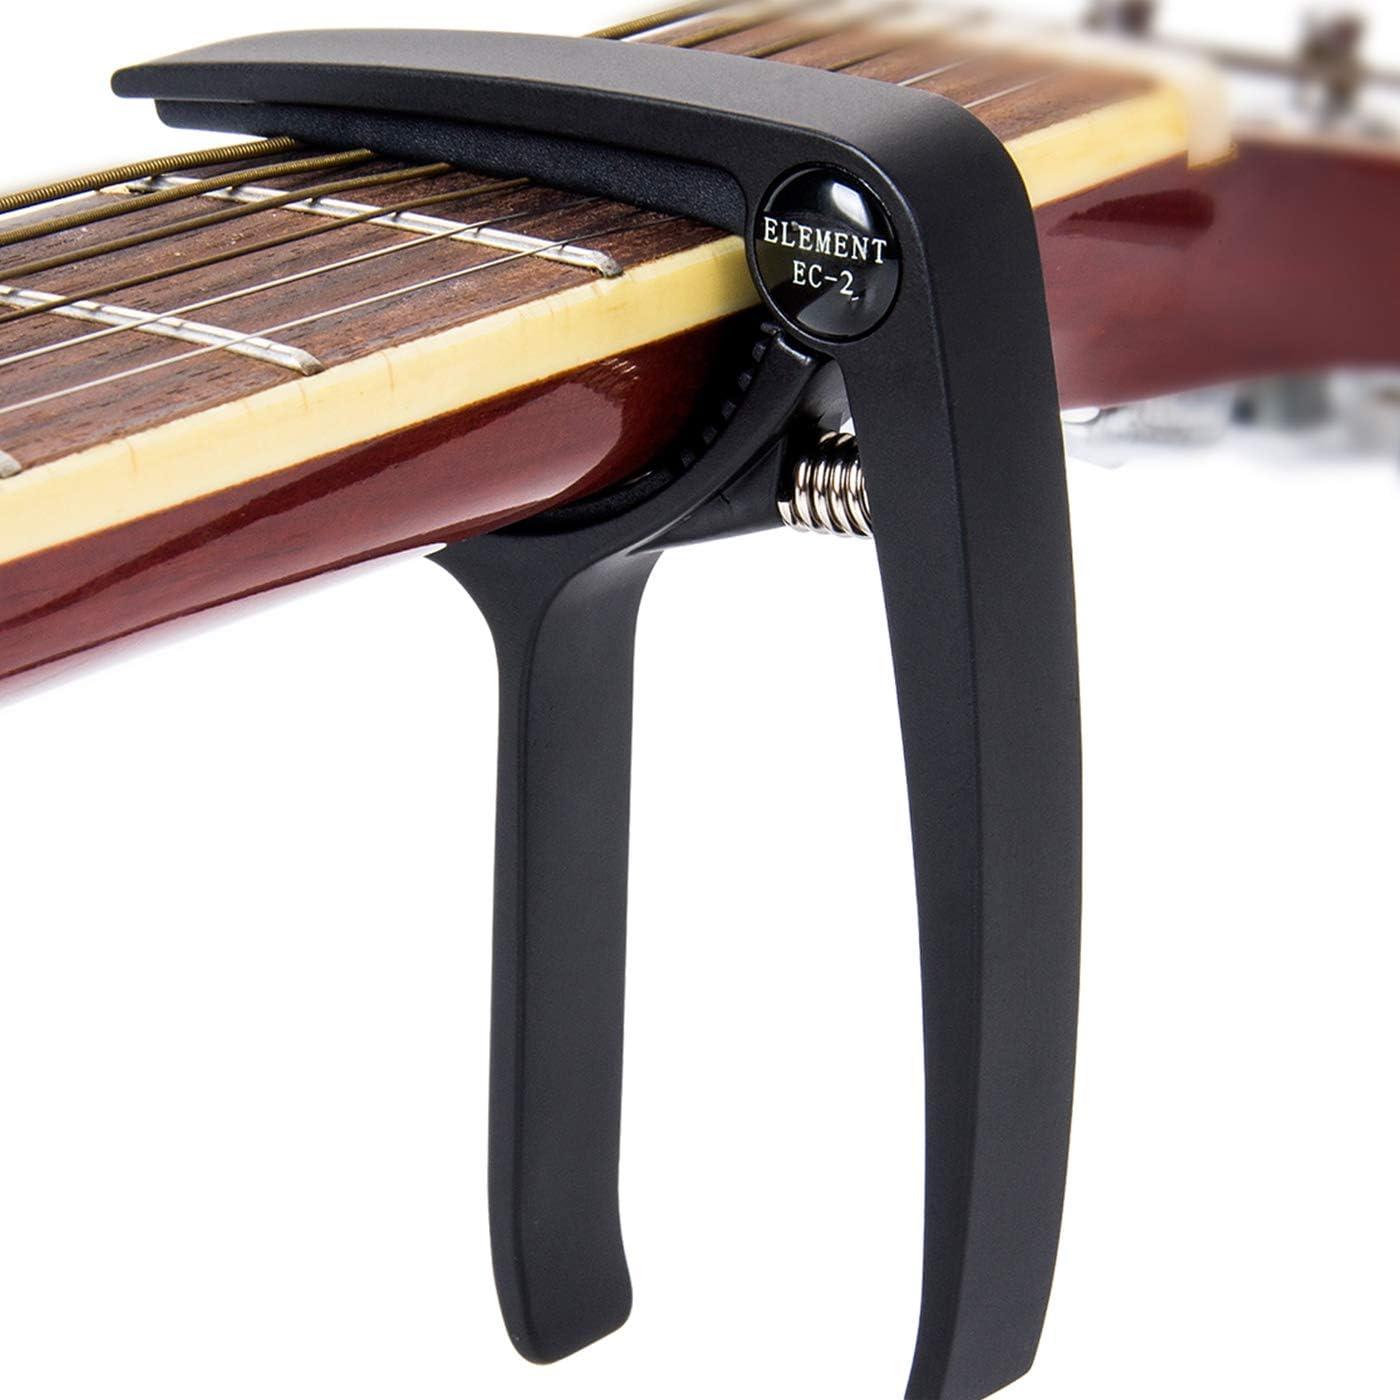 DigitalLife Trigger Capo Guitarra - Cejilla de Guitarra Acústica pare 6 Cuerdas, Guitarra Eléctrica, Bajo, Ukelele [Aleación de Zinc, Negro]